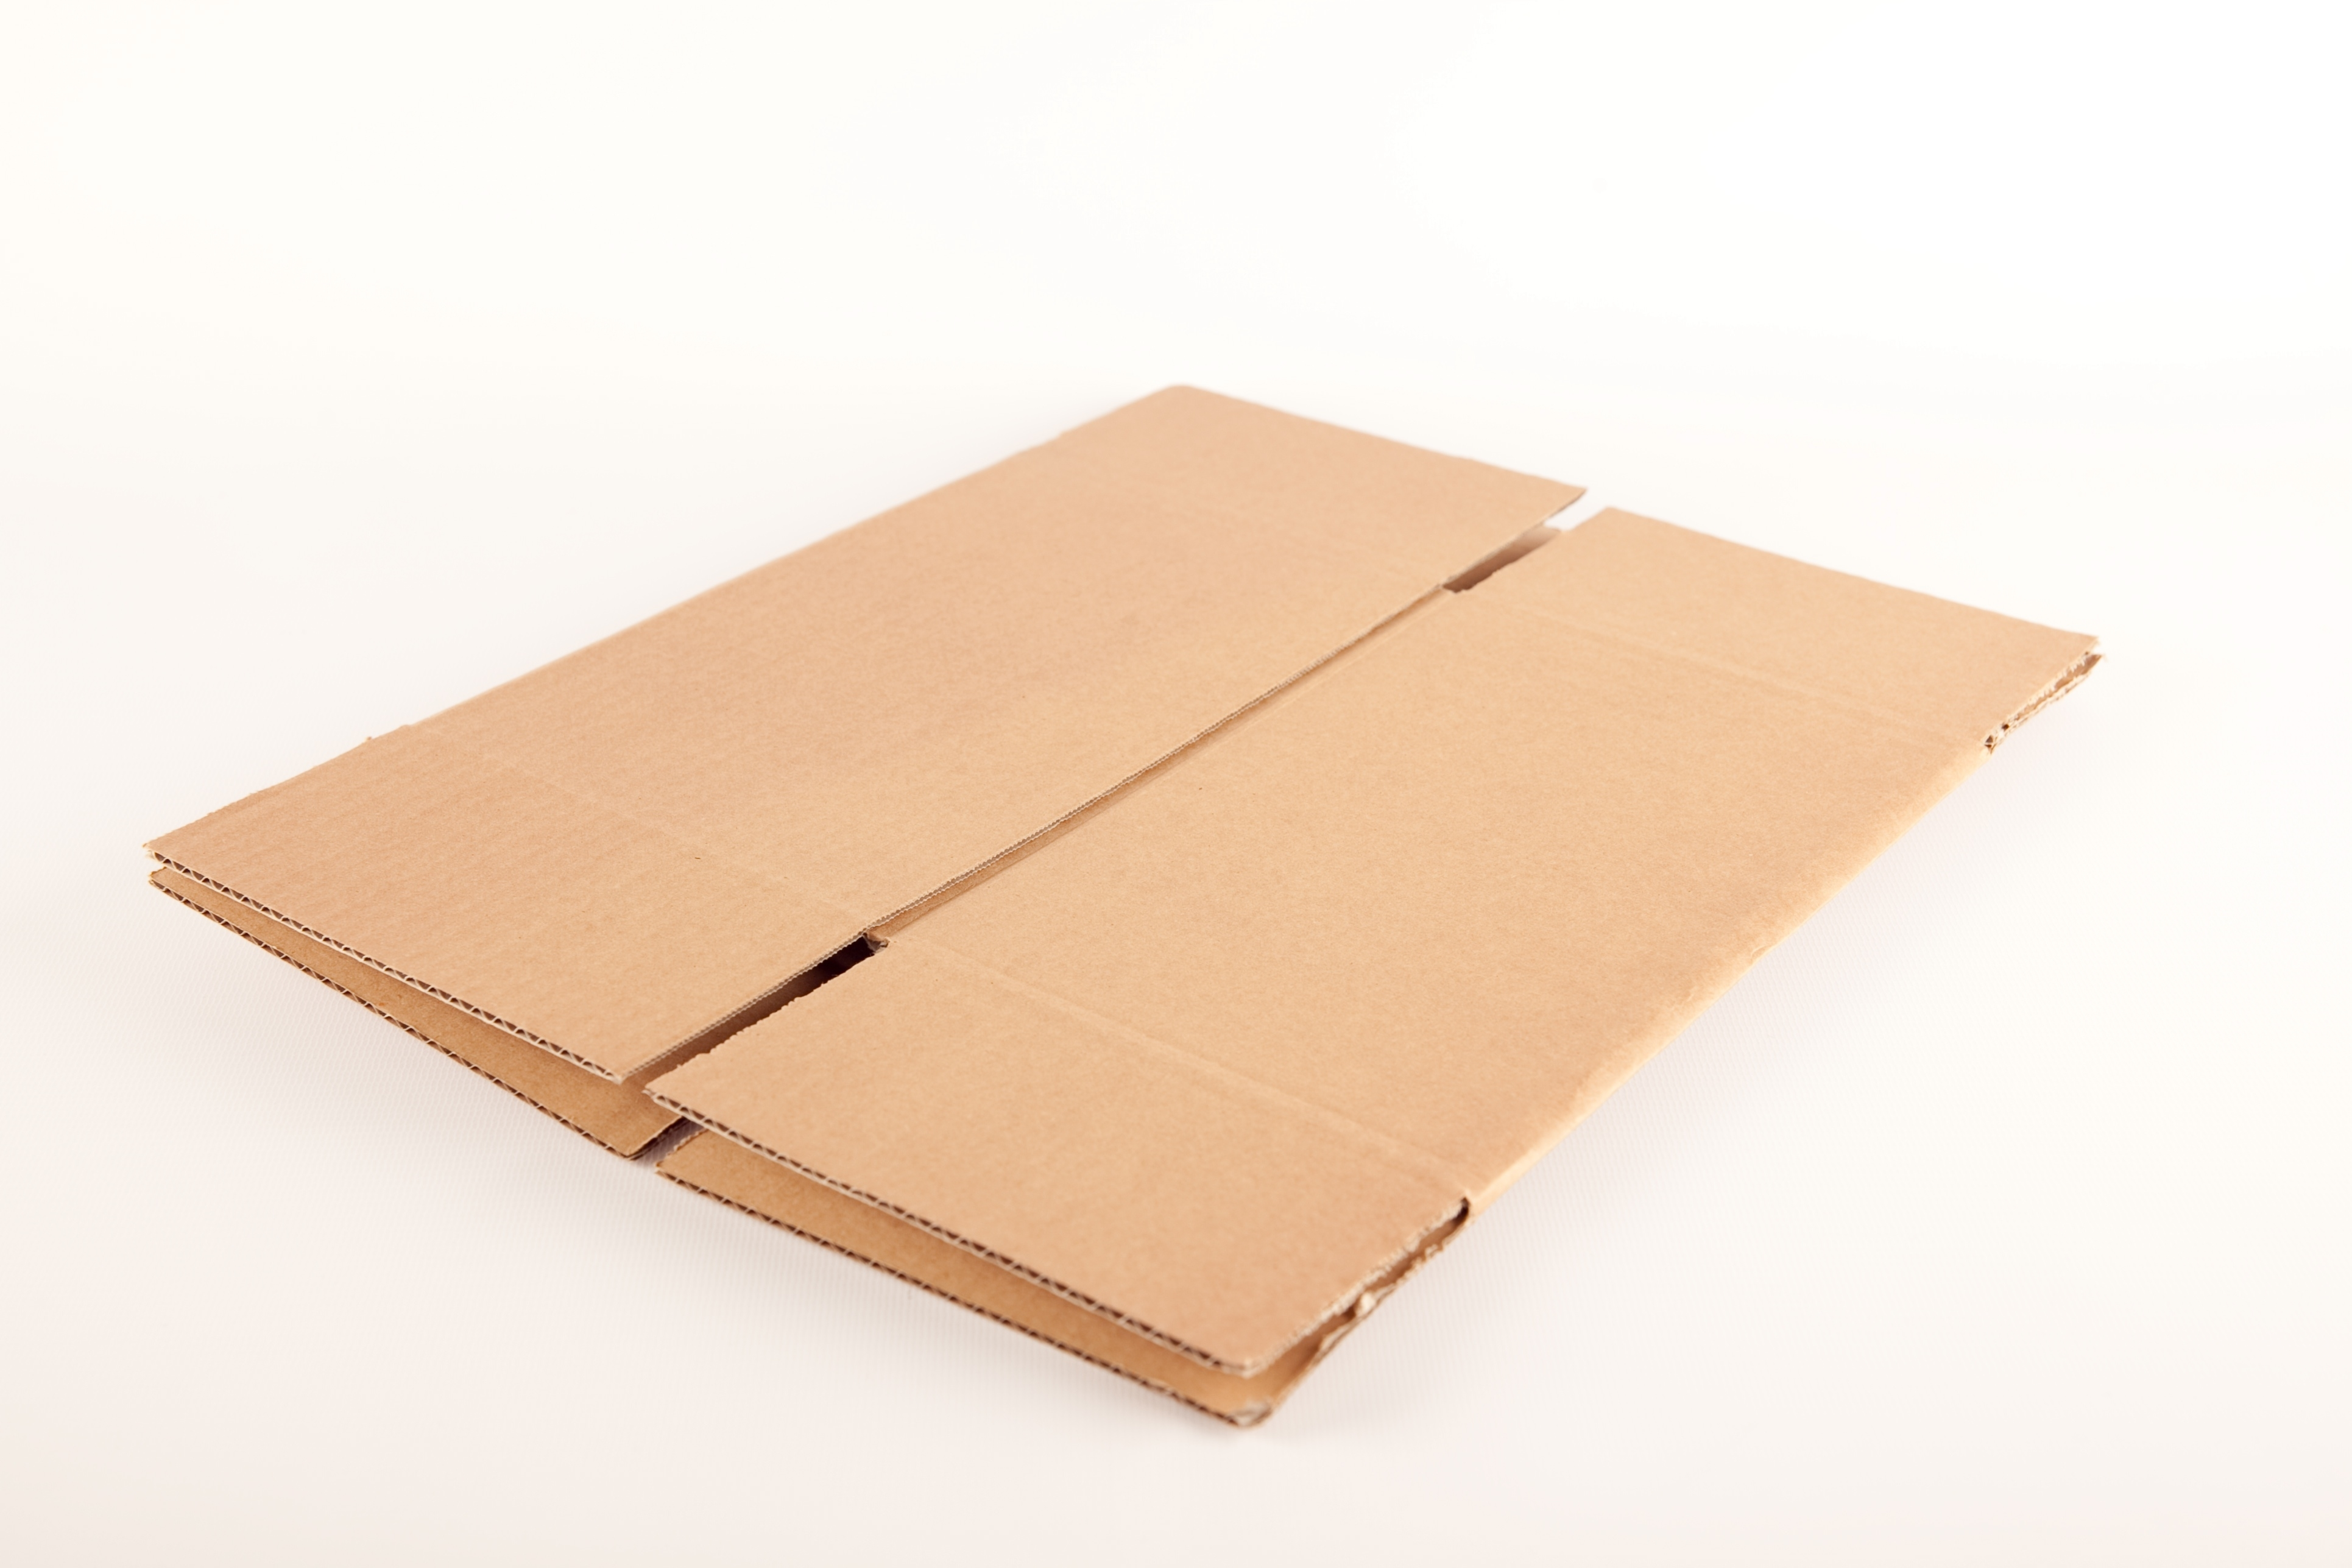 356 x 356 x 356mm Single Wall Cardboard Boxes - 3